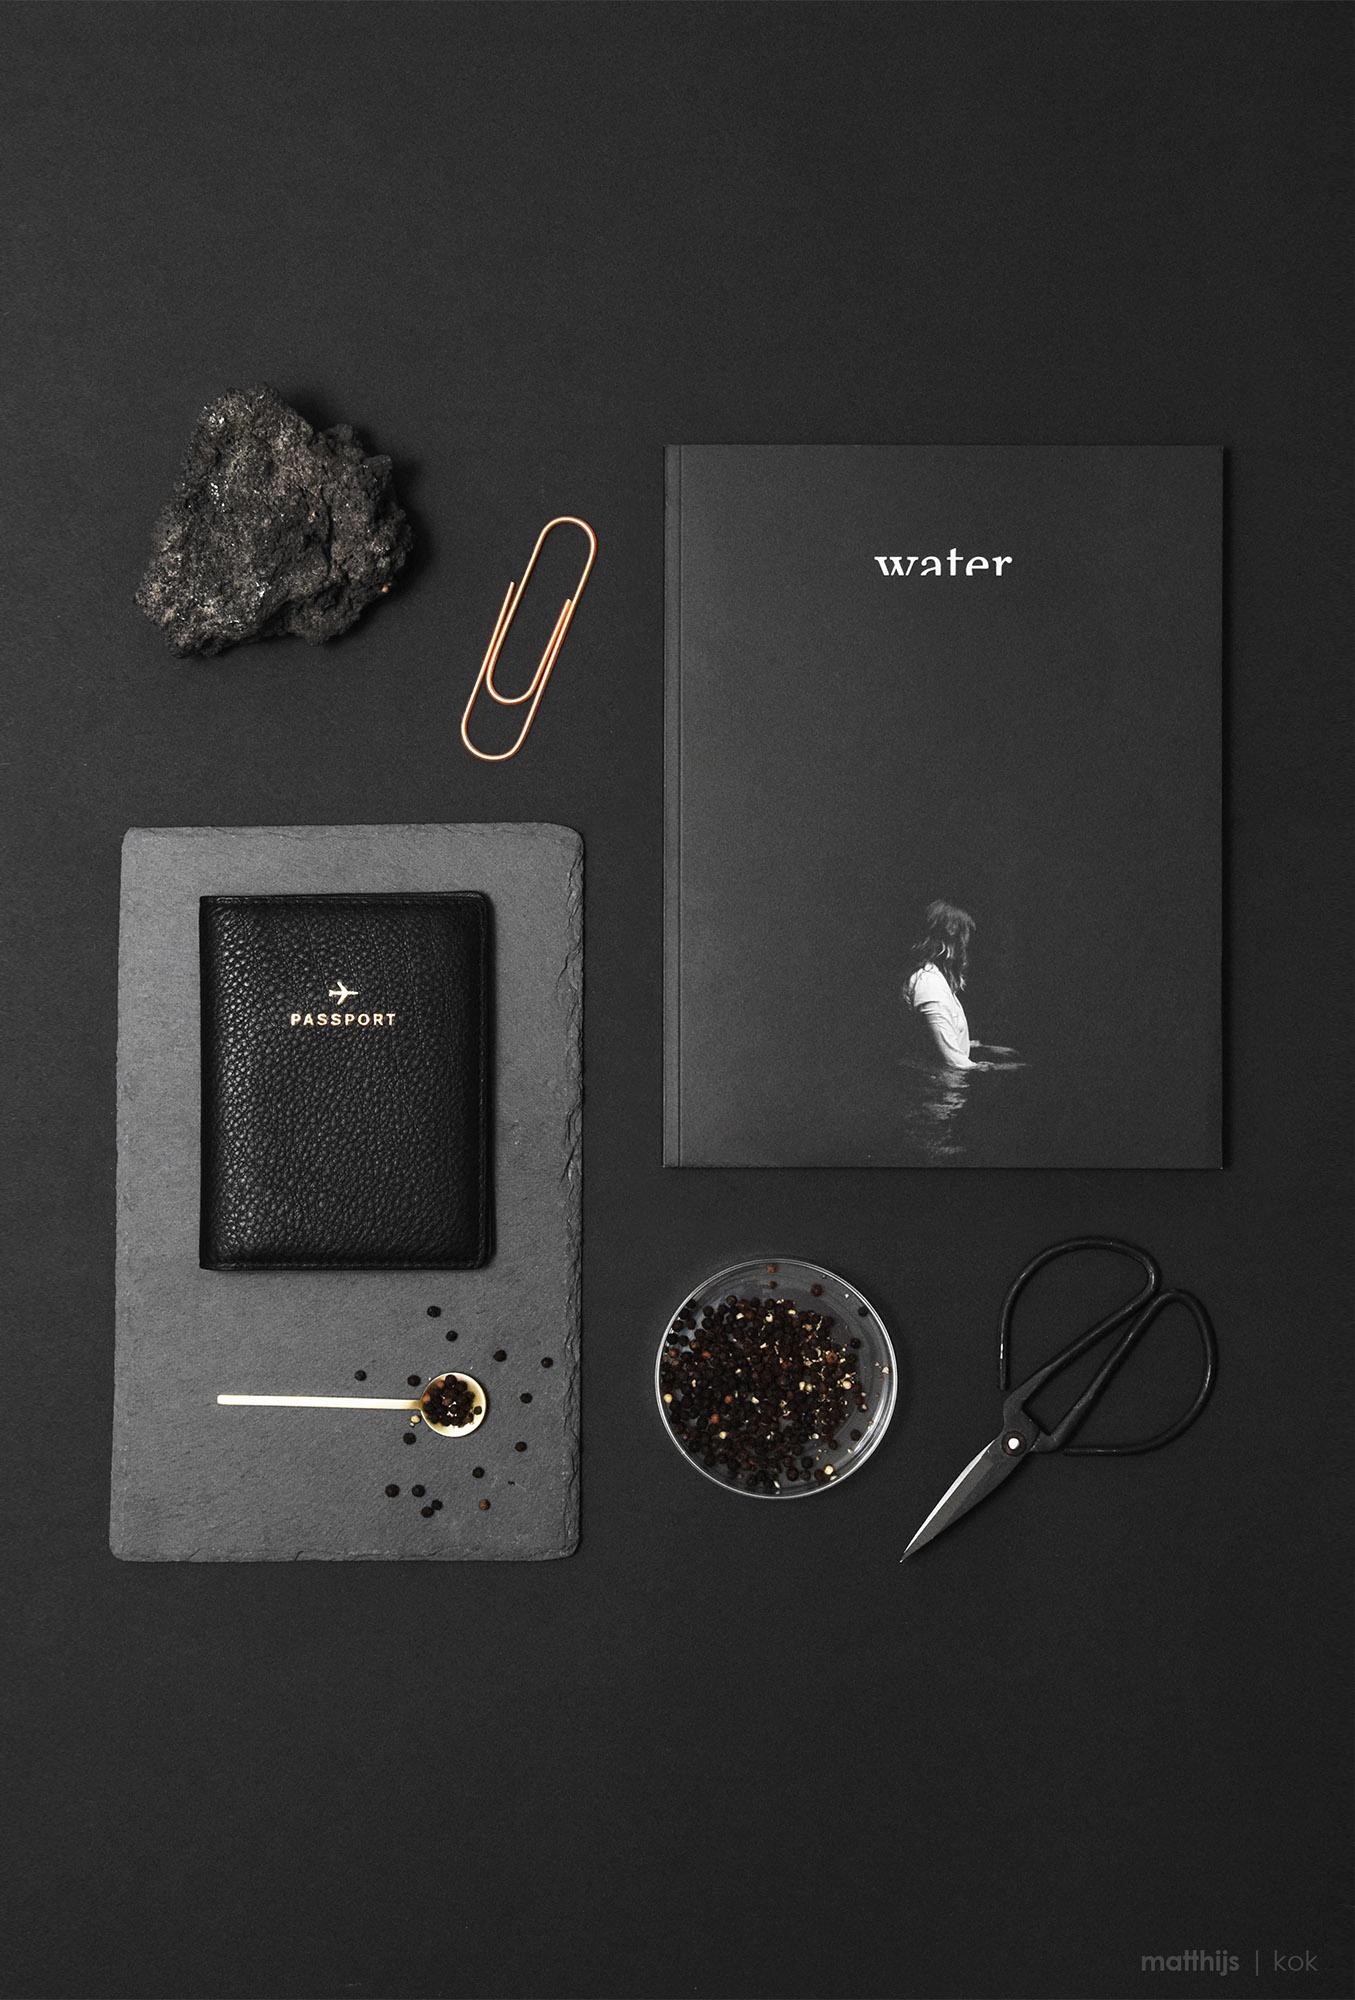 Water Journal Volume 1 | Photo by Matthijs Kok